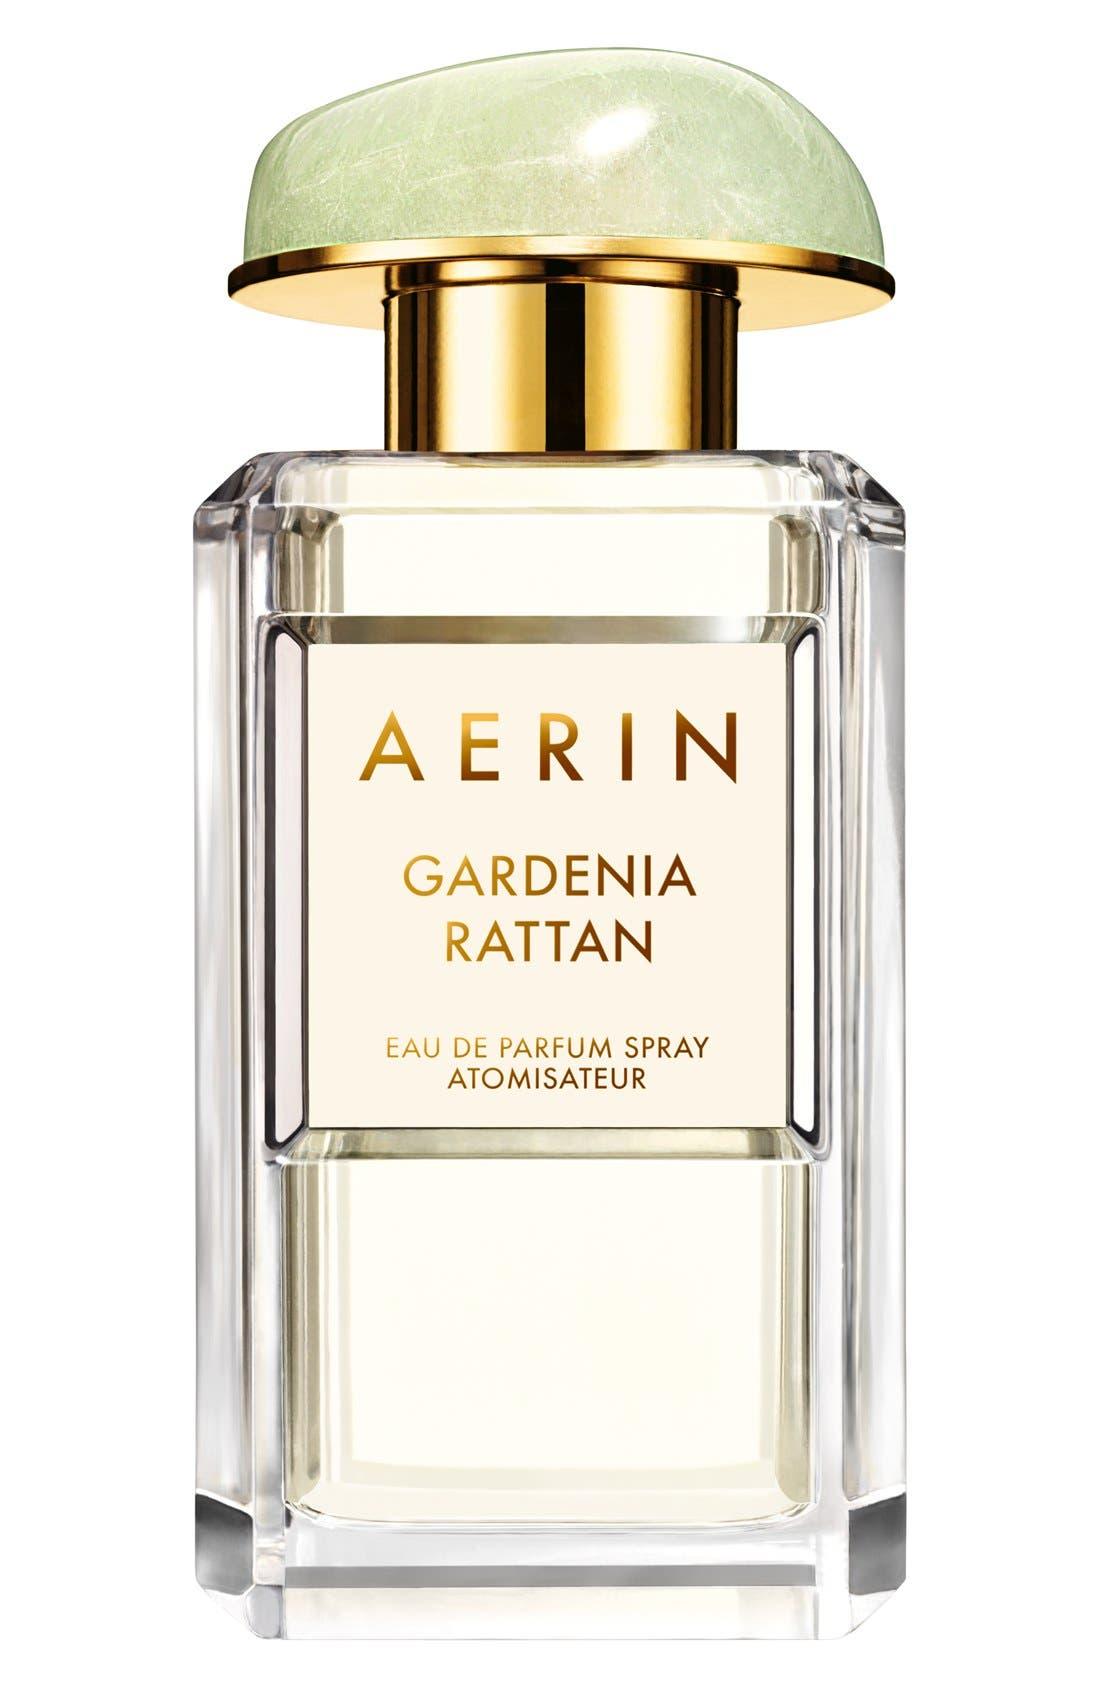 AERIN Beauty Gardenia Rattan Eau de Parfum Spray